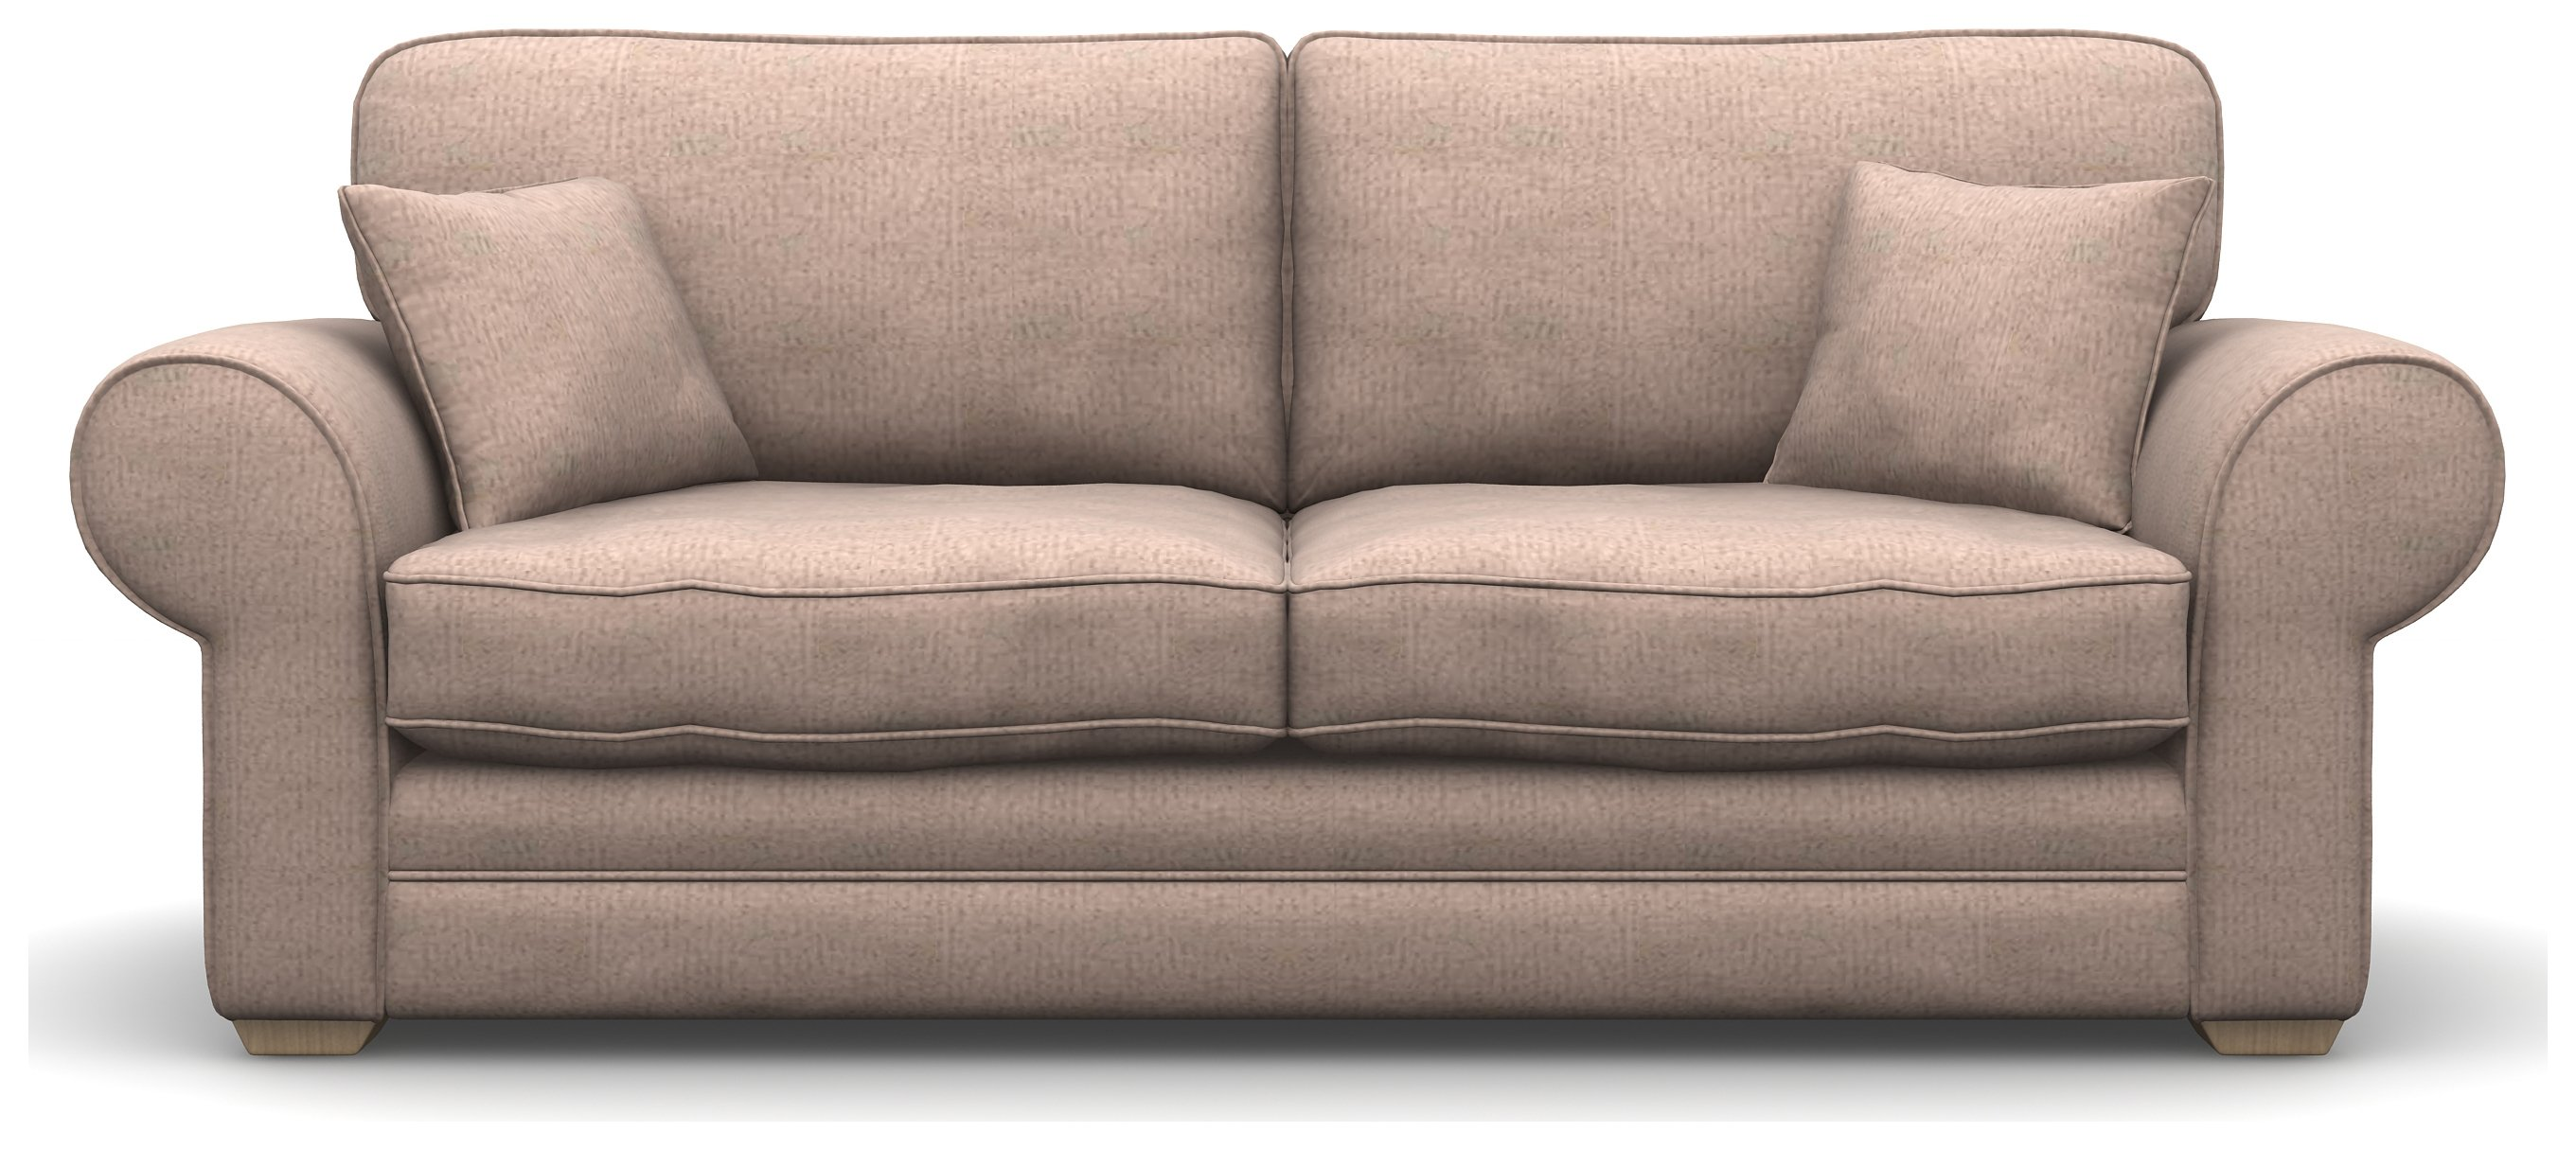 Heart of House Chedworth 3 Seater Mushroom Fabric Sofa